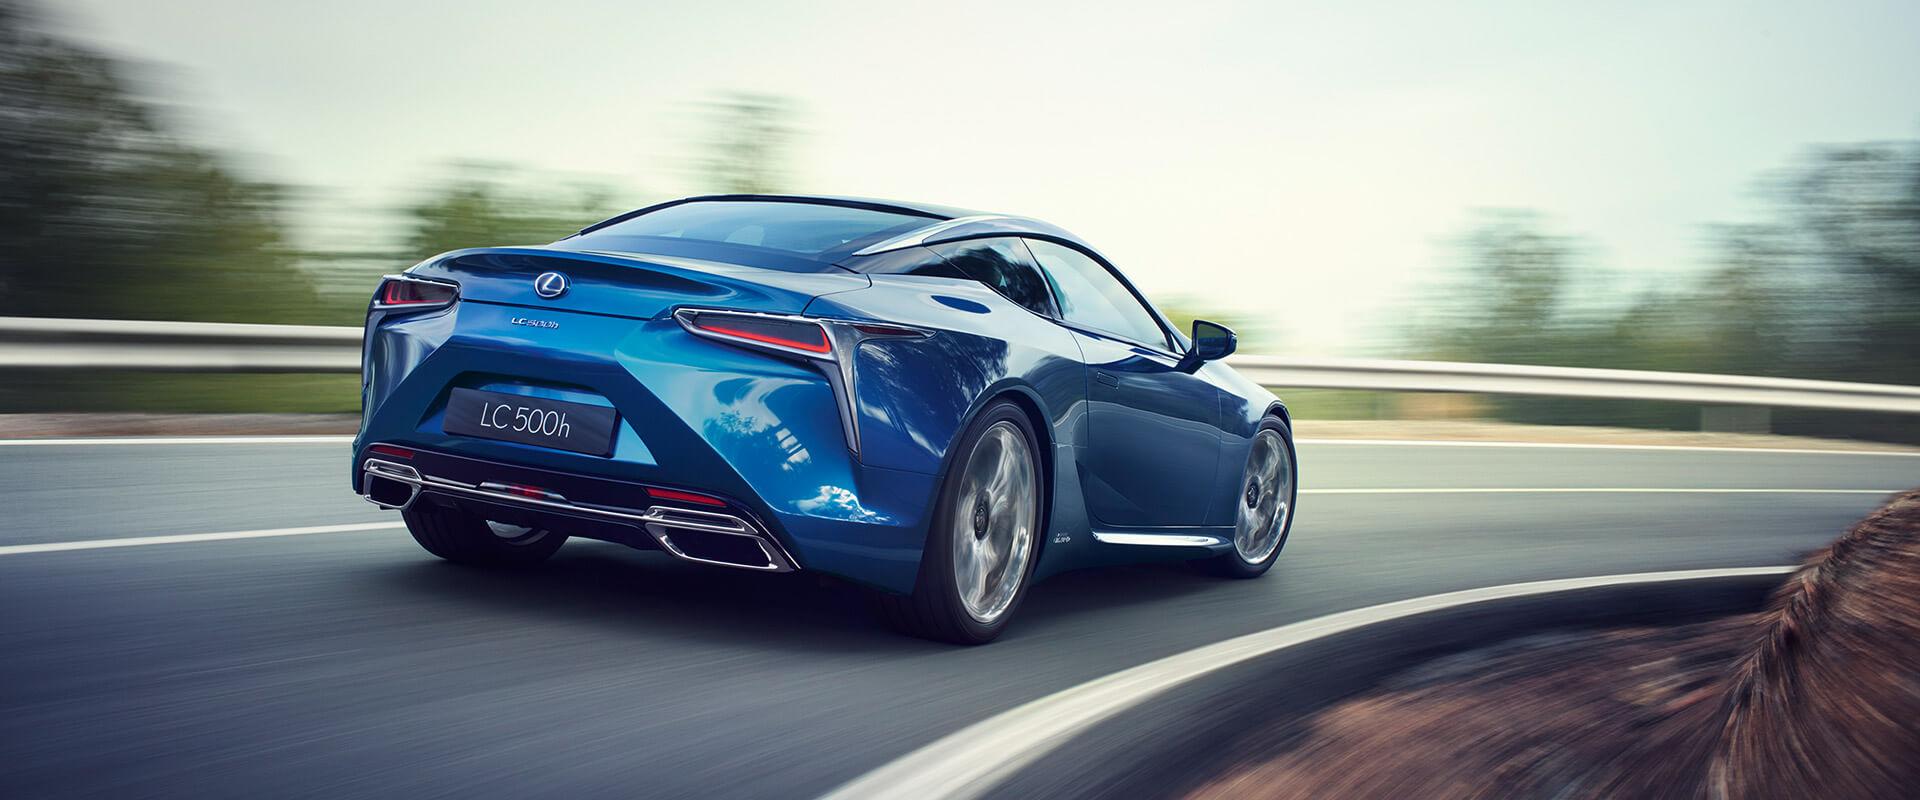 sininen Lexus LC 500h Hybrid hero